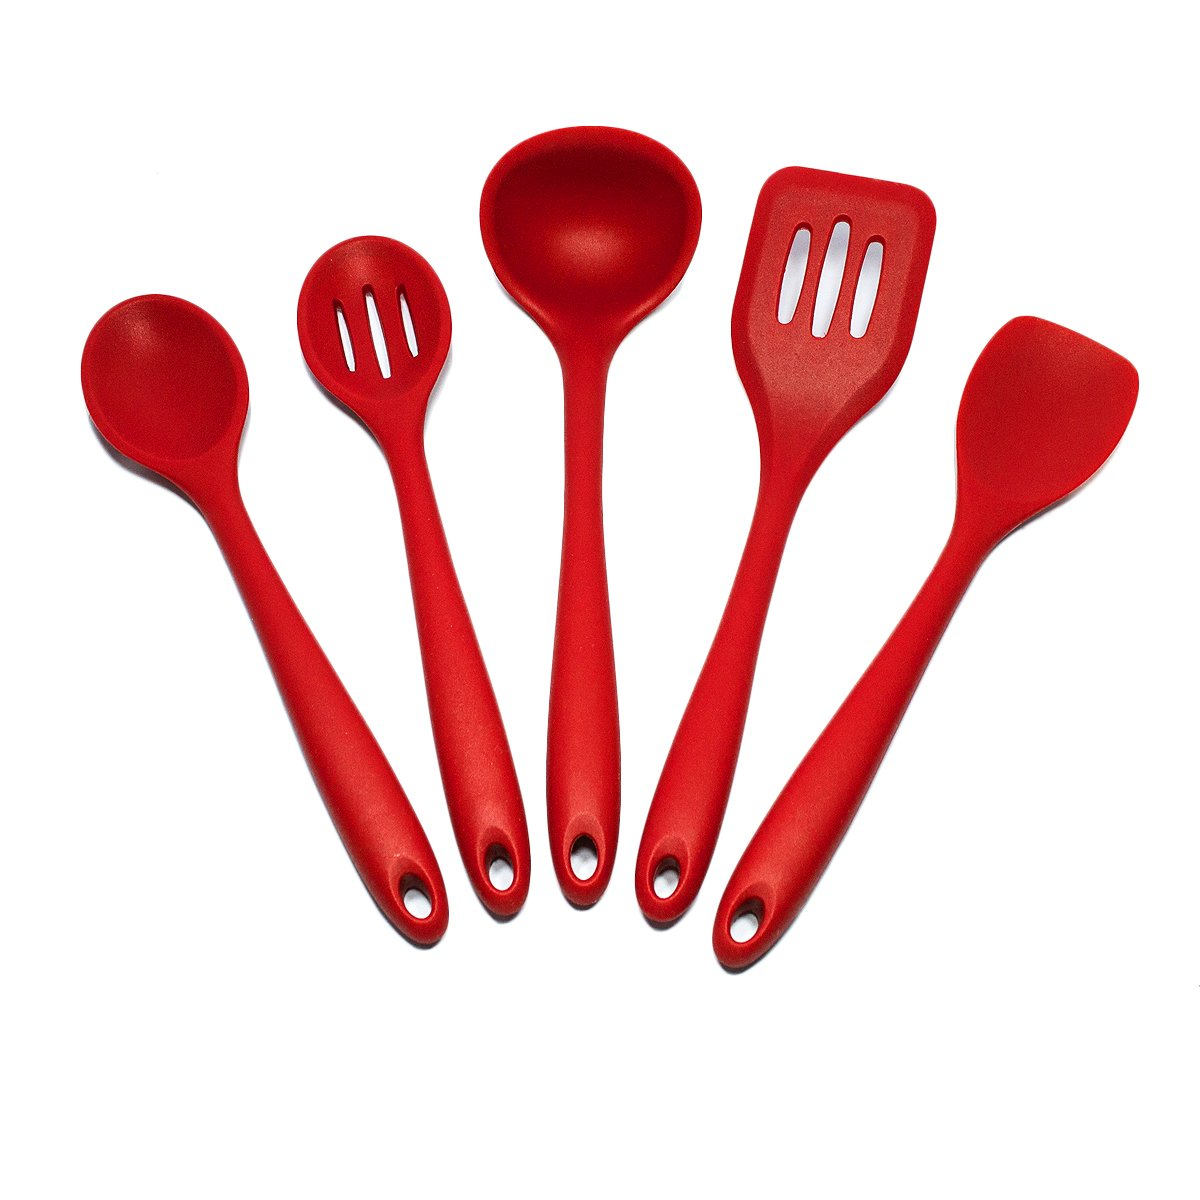 Merveilleux Amazon.com: Sorbus Silicone Kitchen Utensil Set In Solid Coating Dishwasher  Safe (5 Piece): Kitchen U0026 Dining